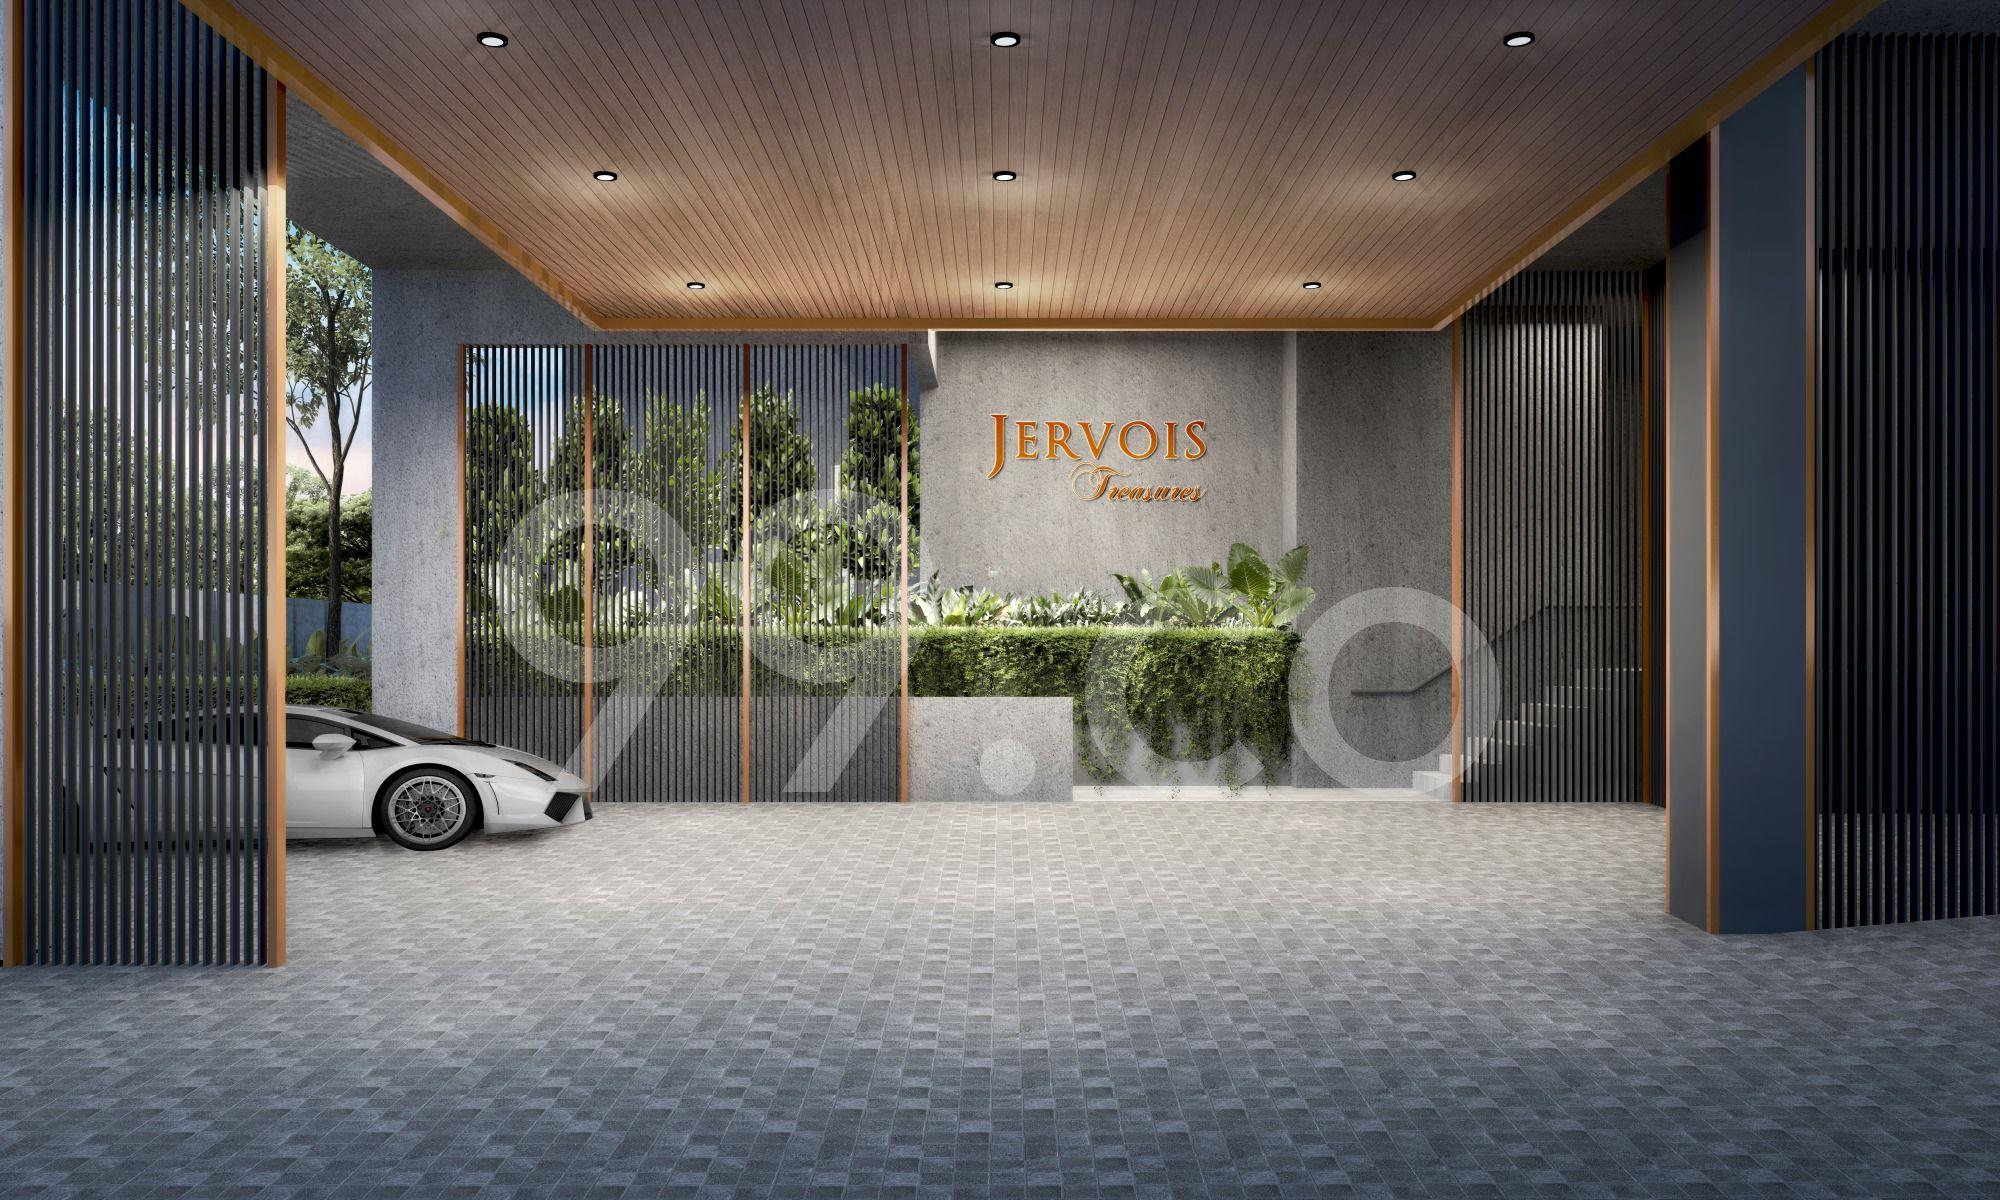 Jervois Treasures Entrance